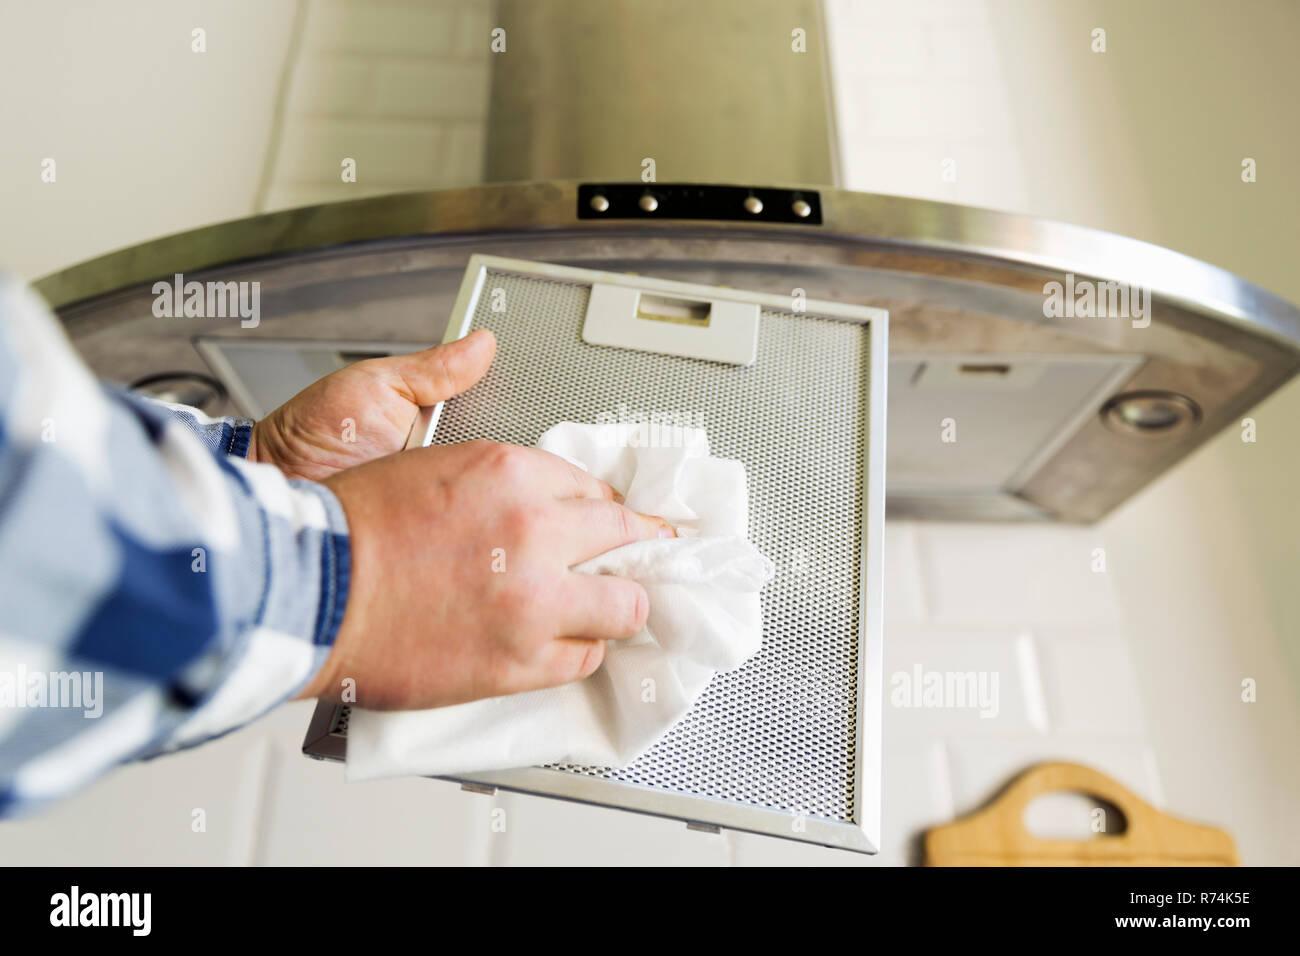 Dunstabzugshaube Aluminium Filter : Des menschen hände reinigung aluminium filter für abzugshaube